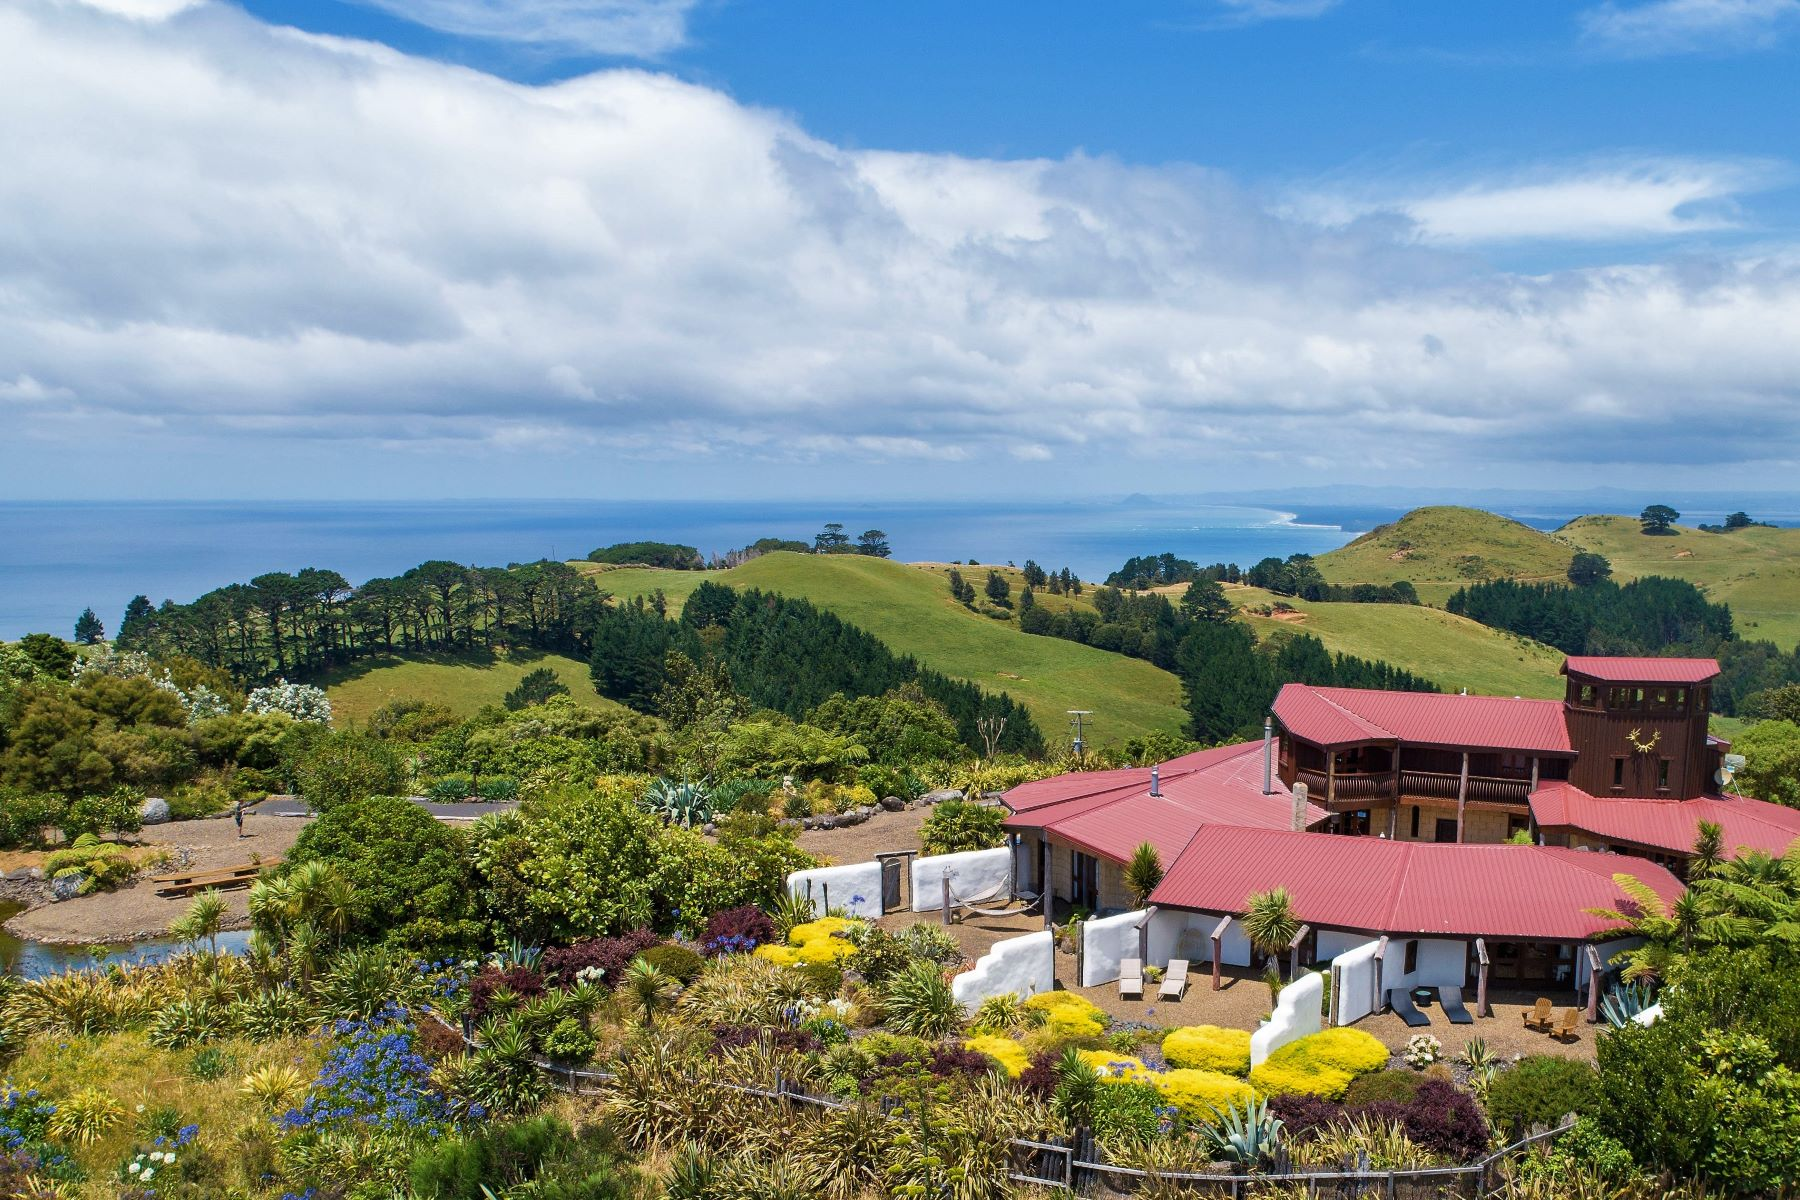 Single Family Homes for Sale at 263E Ngatitangata Road Other Waikato, Waikato 3681 New Zealand